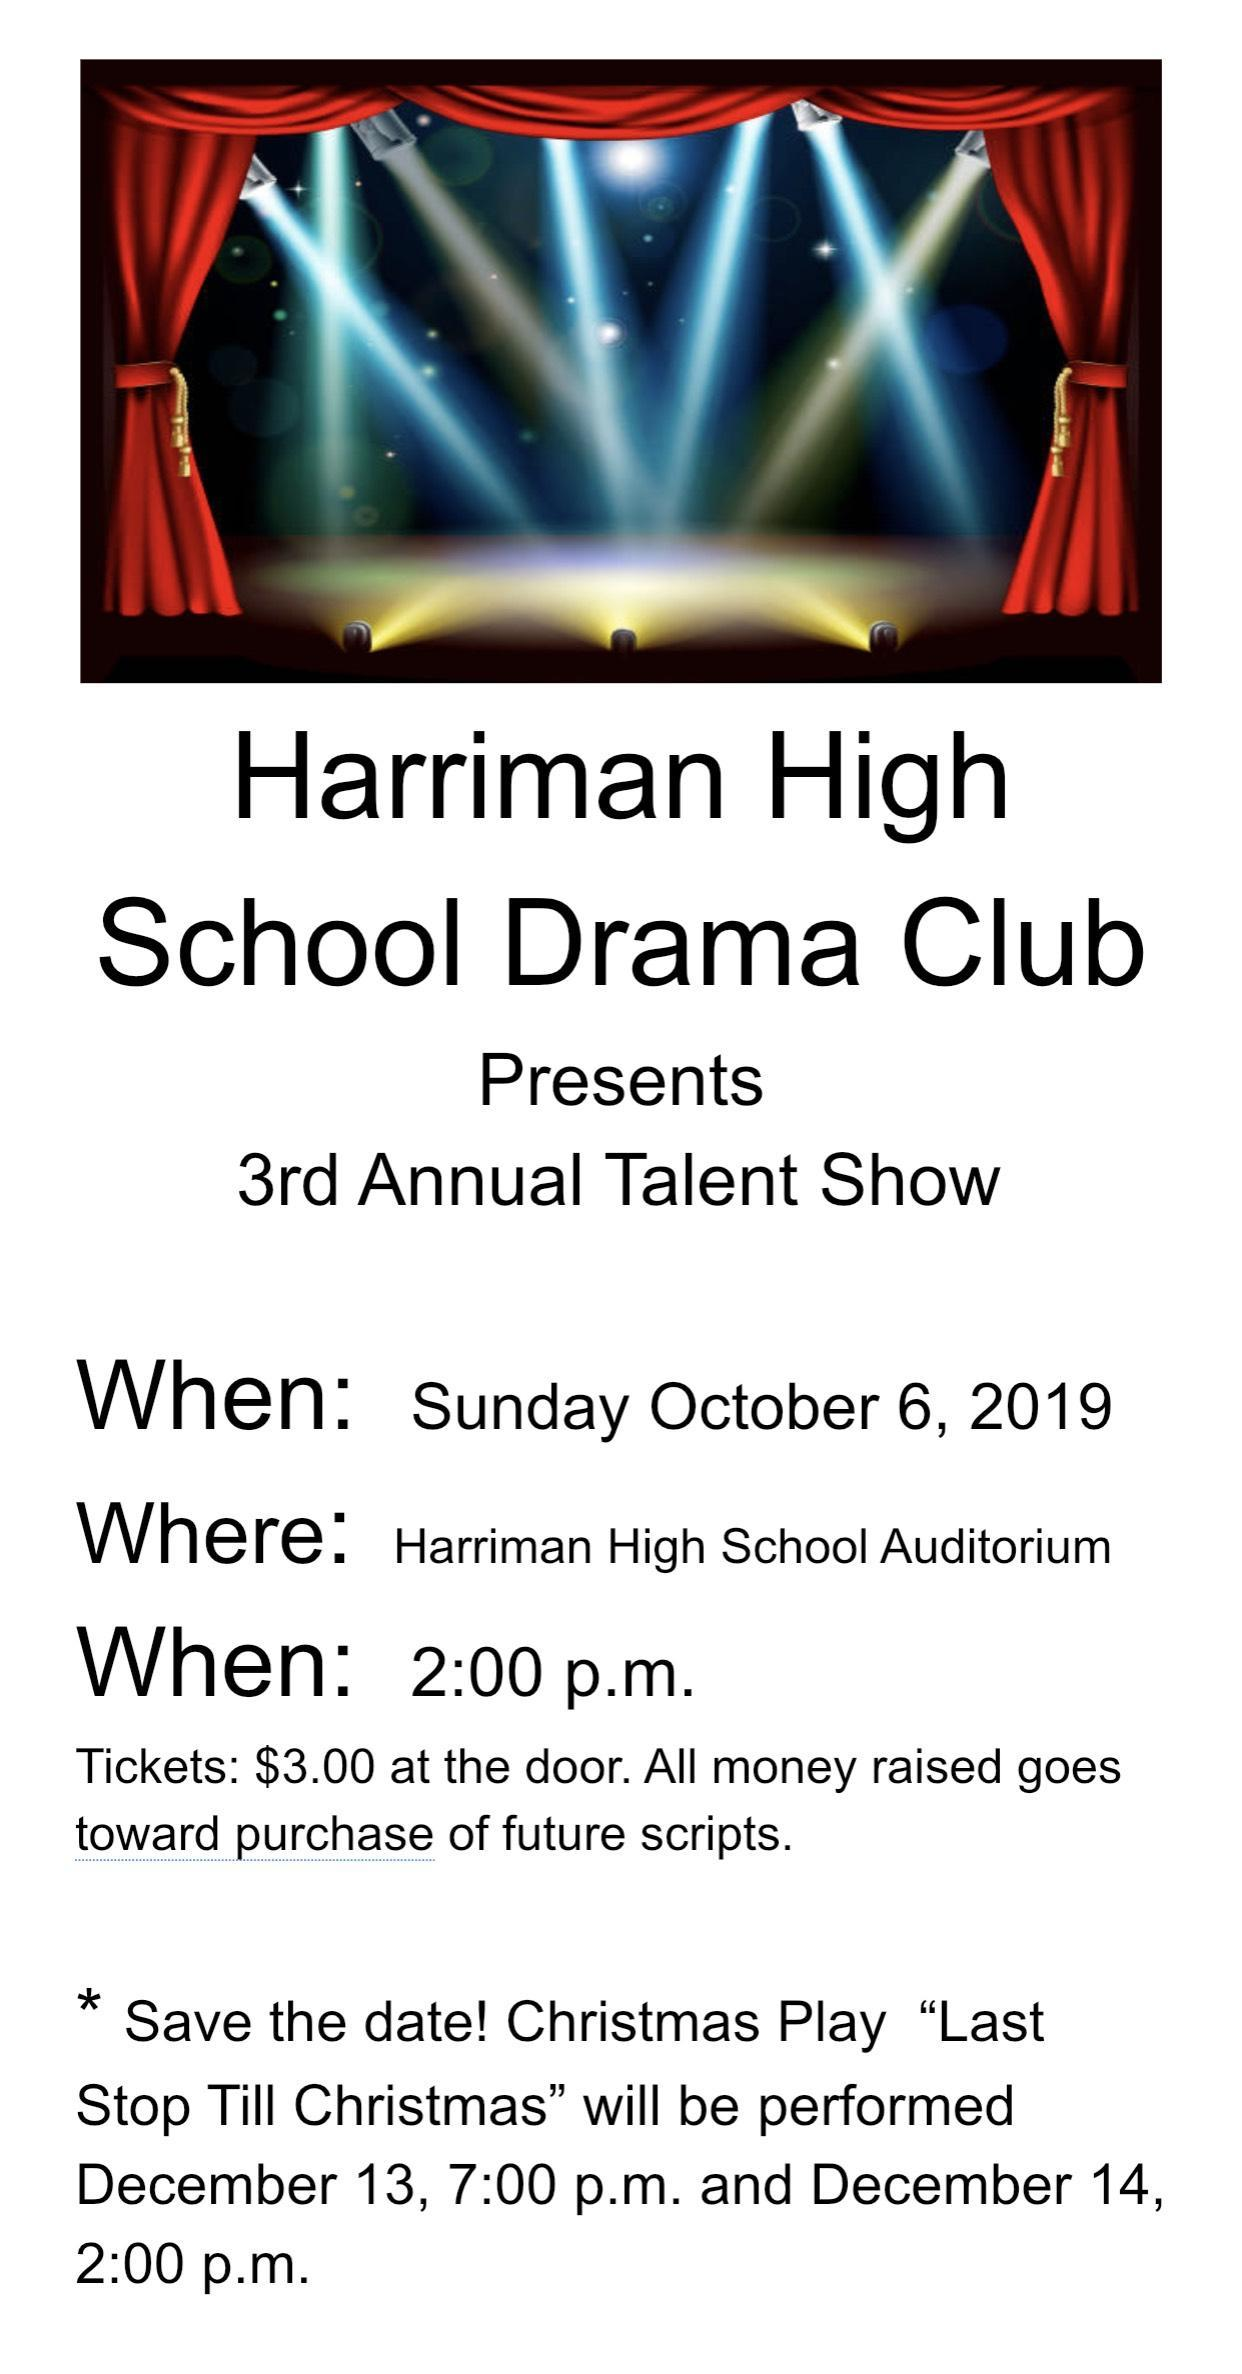 HHS Drama Club Presents: 3rd Annual Talent Show